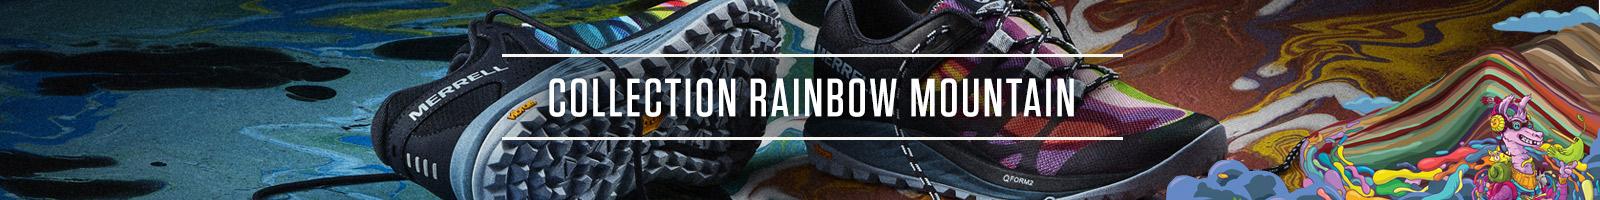 Collection Rainbow Mountain